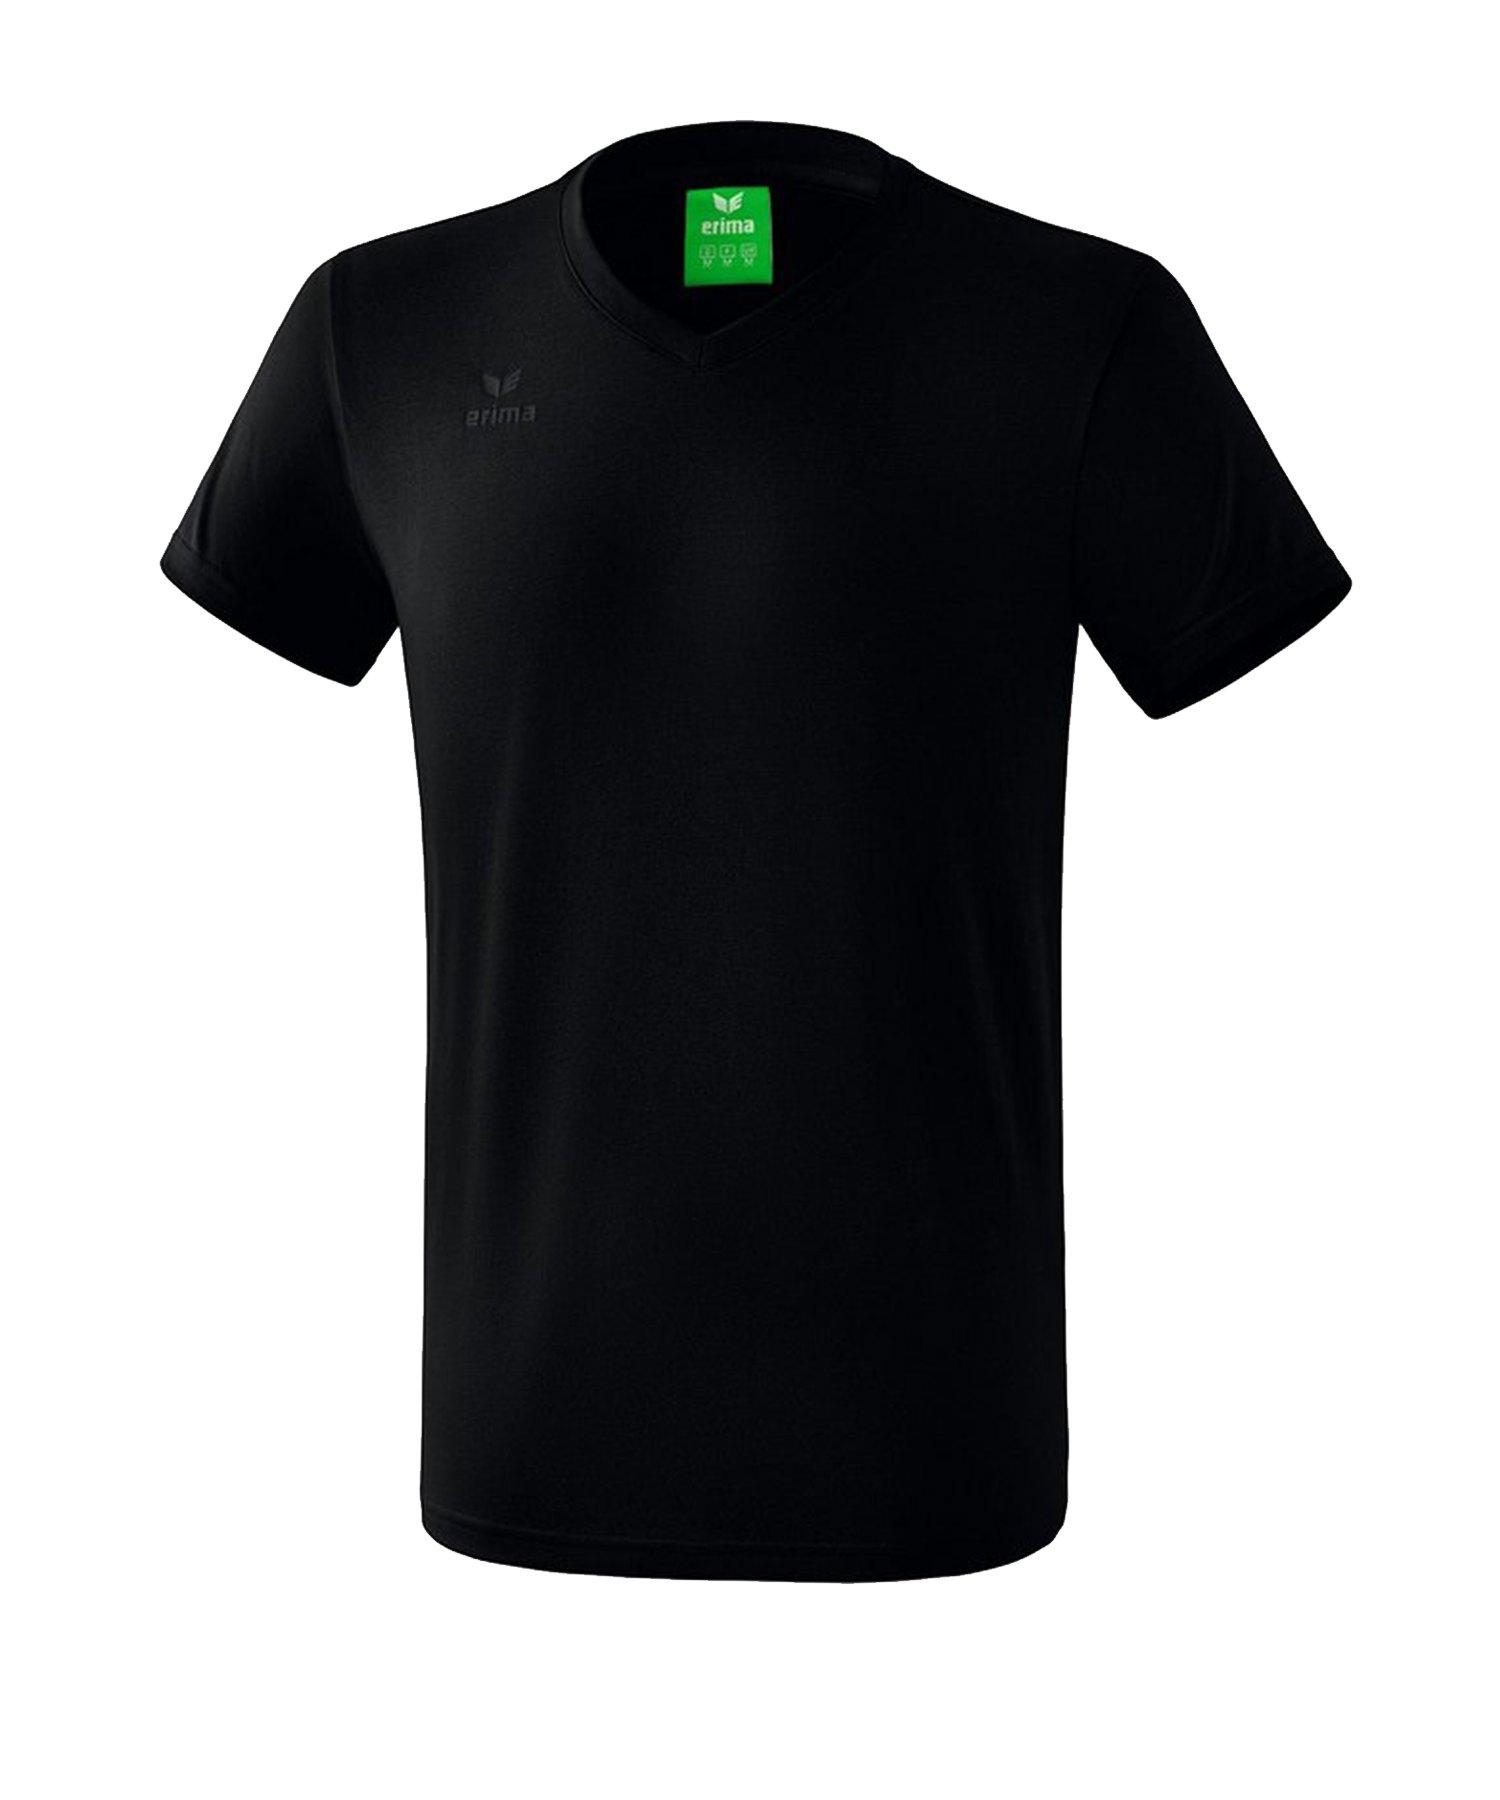 Erima Style T-Shirt Schwarz - Schwarz